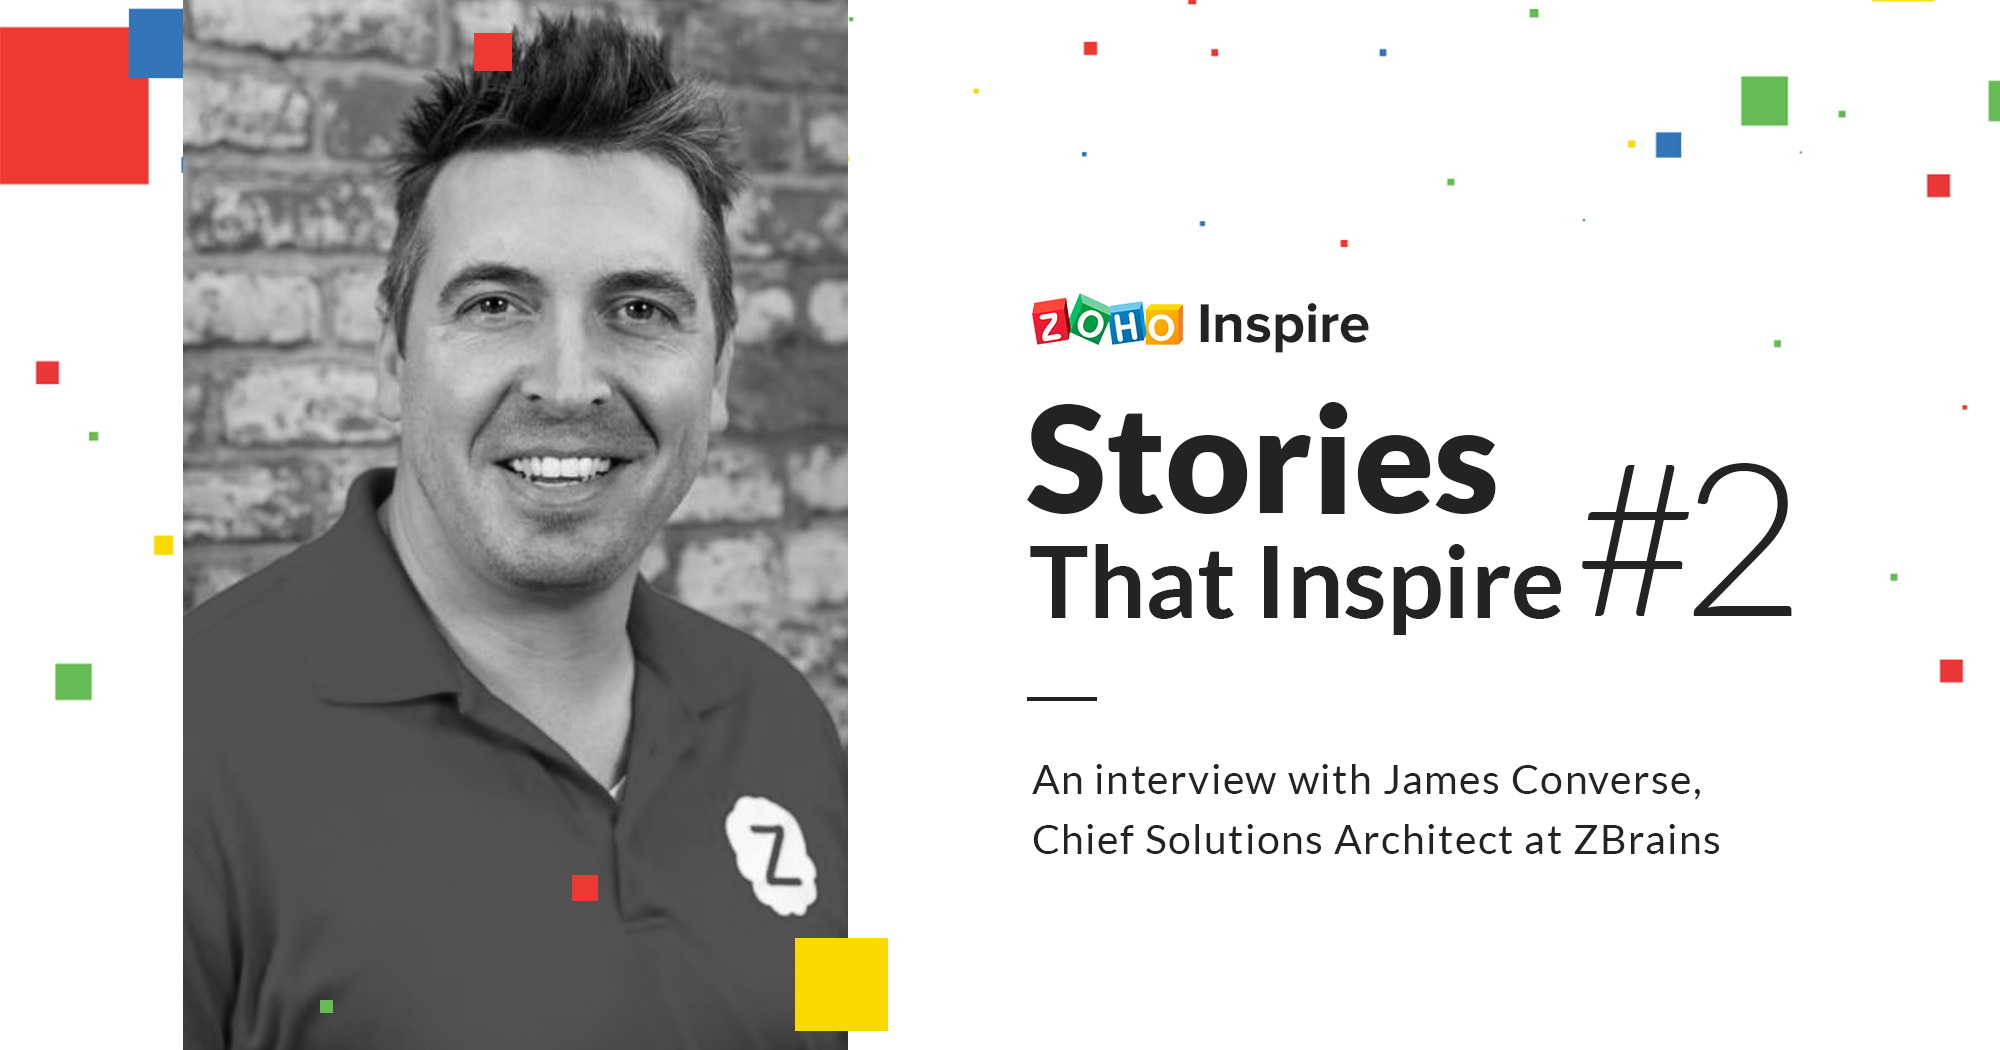 Stories That Inspire #2 : Meet James Converse, CRM consultant extraordinaire